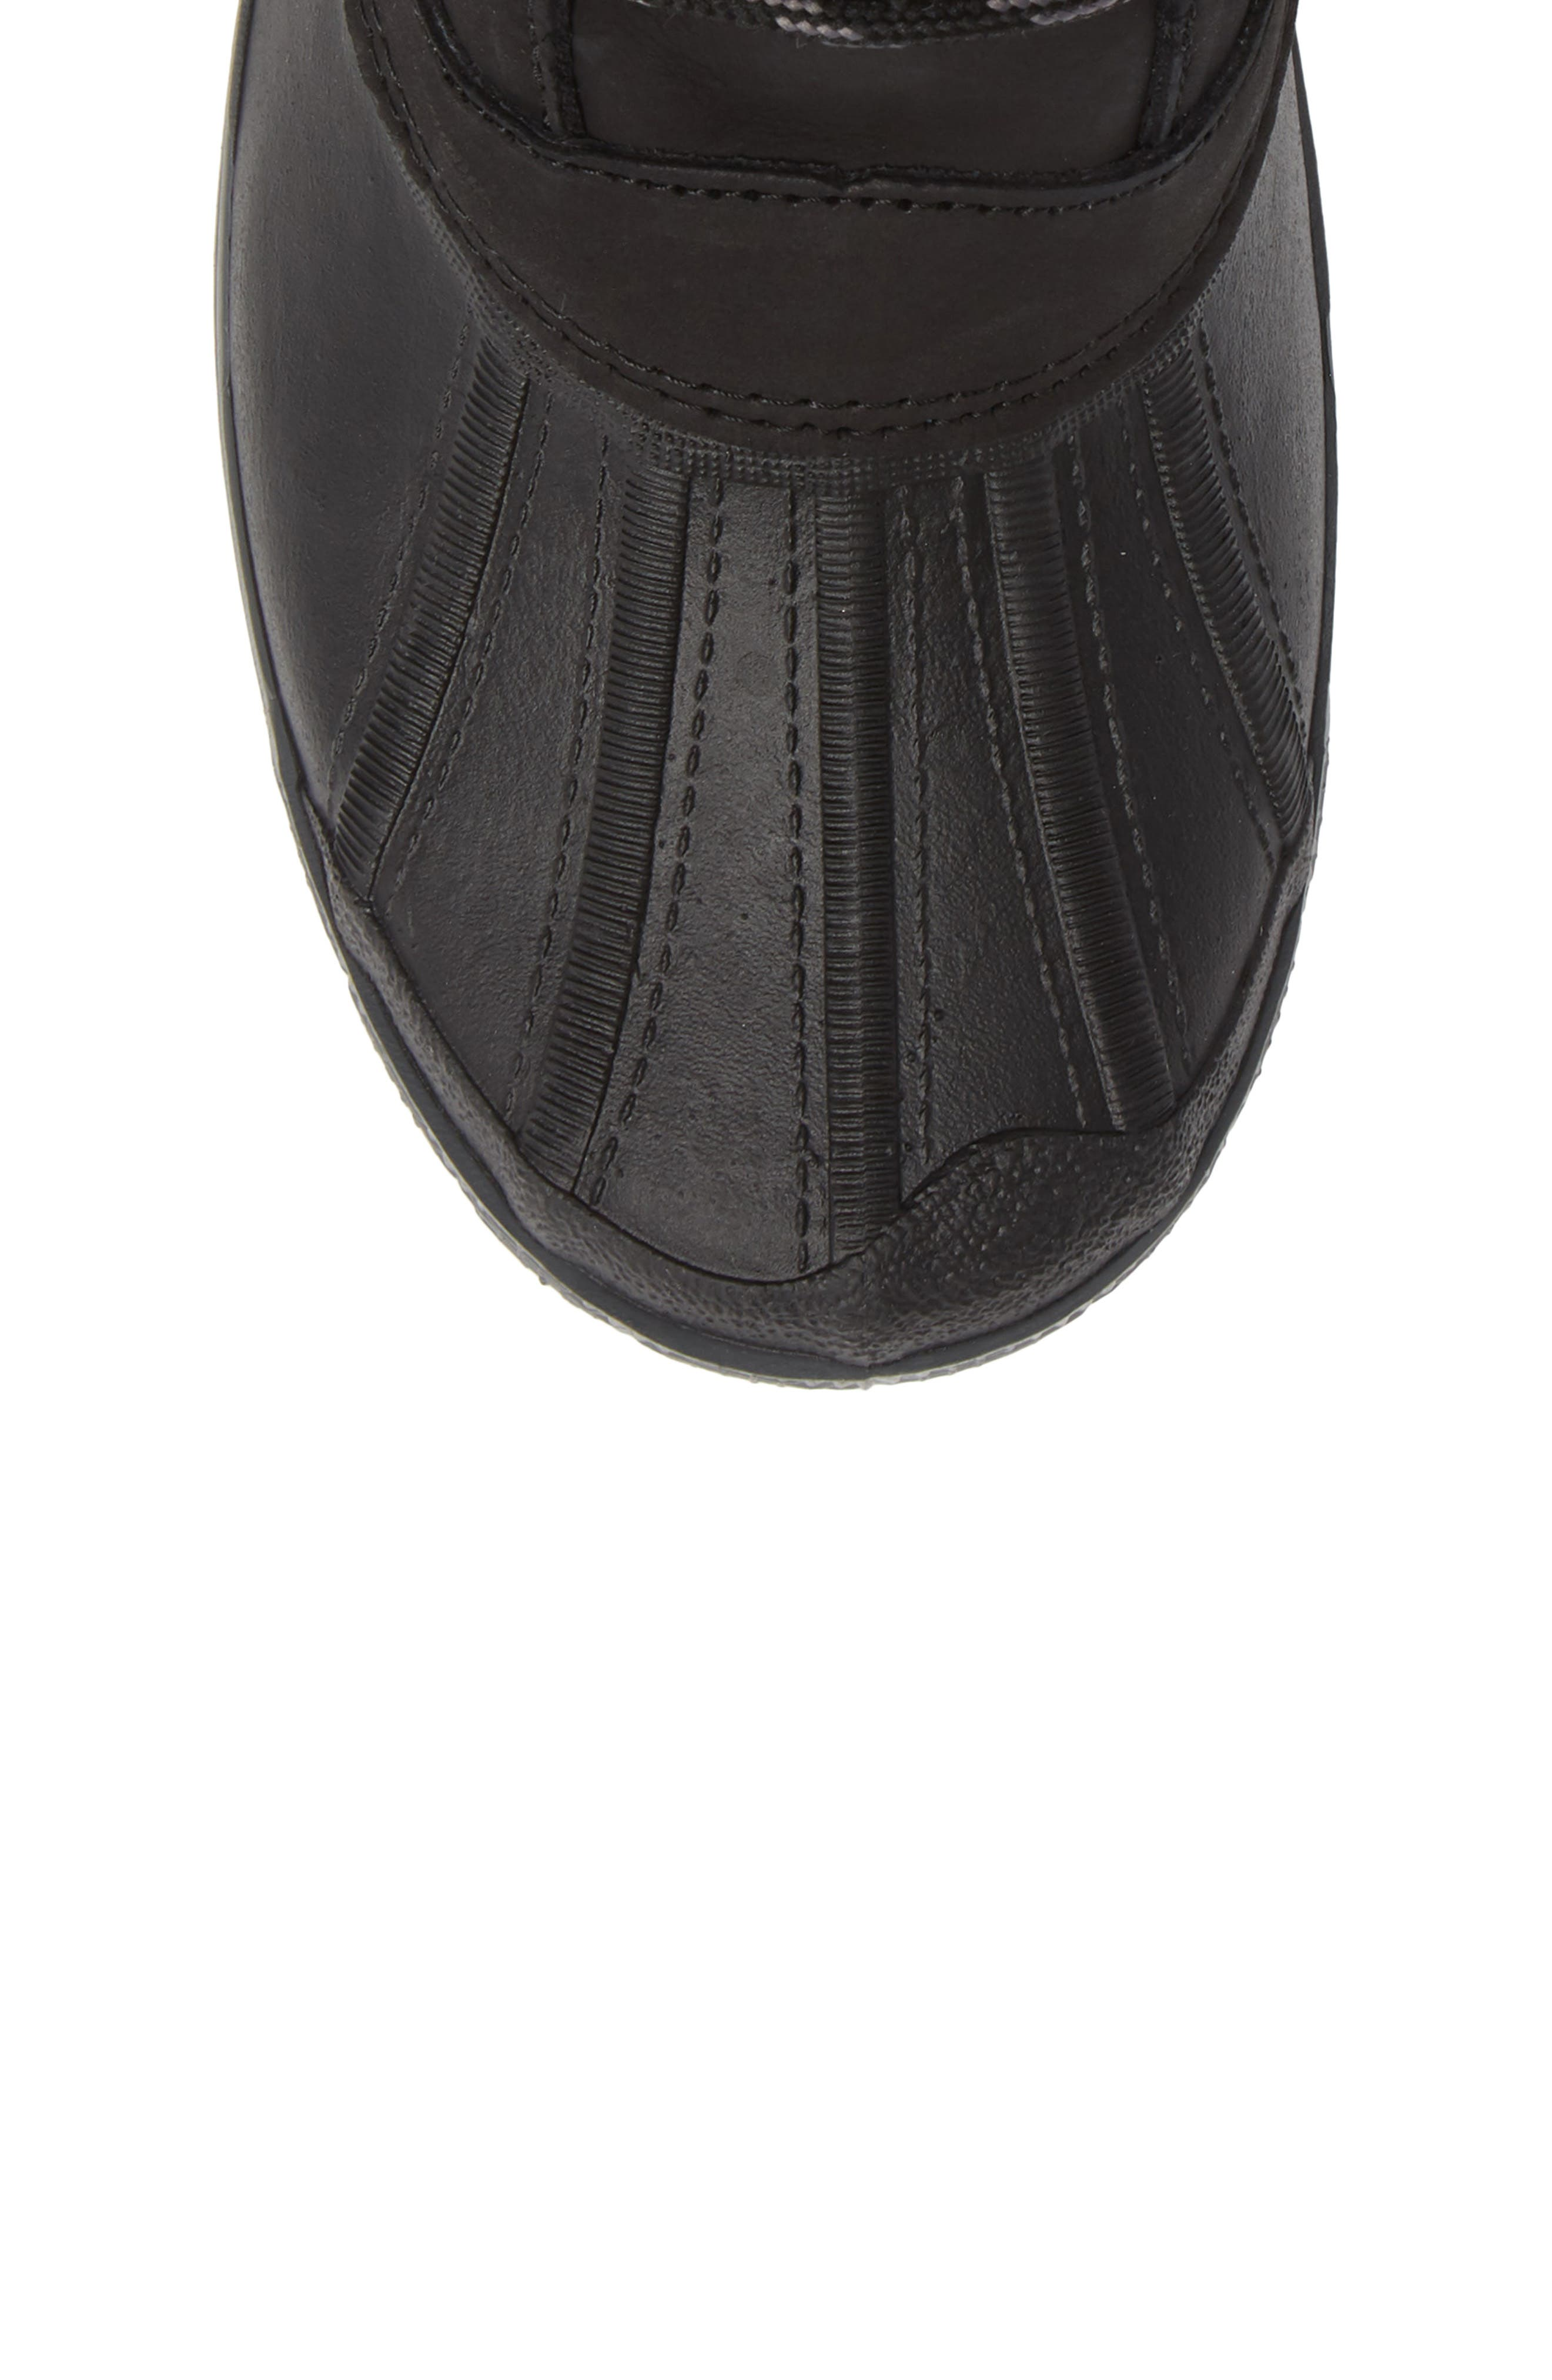 Cali Waterproof Insulated Boot,                             Alternate thumbnail 5, color,                             BROWN/ BLACK